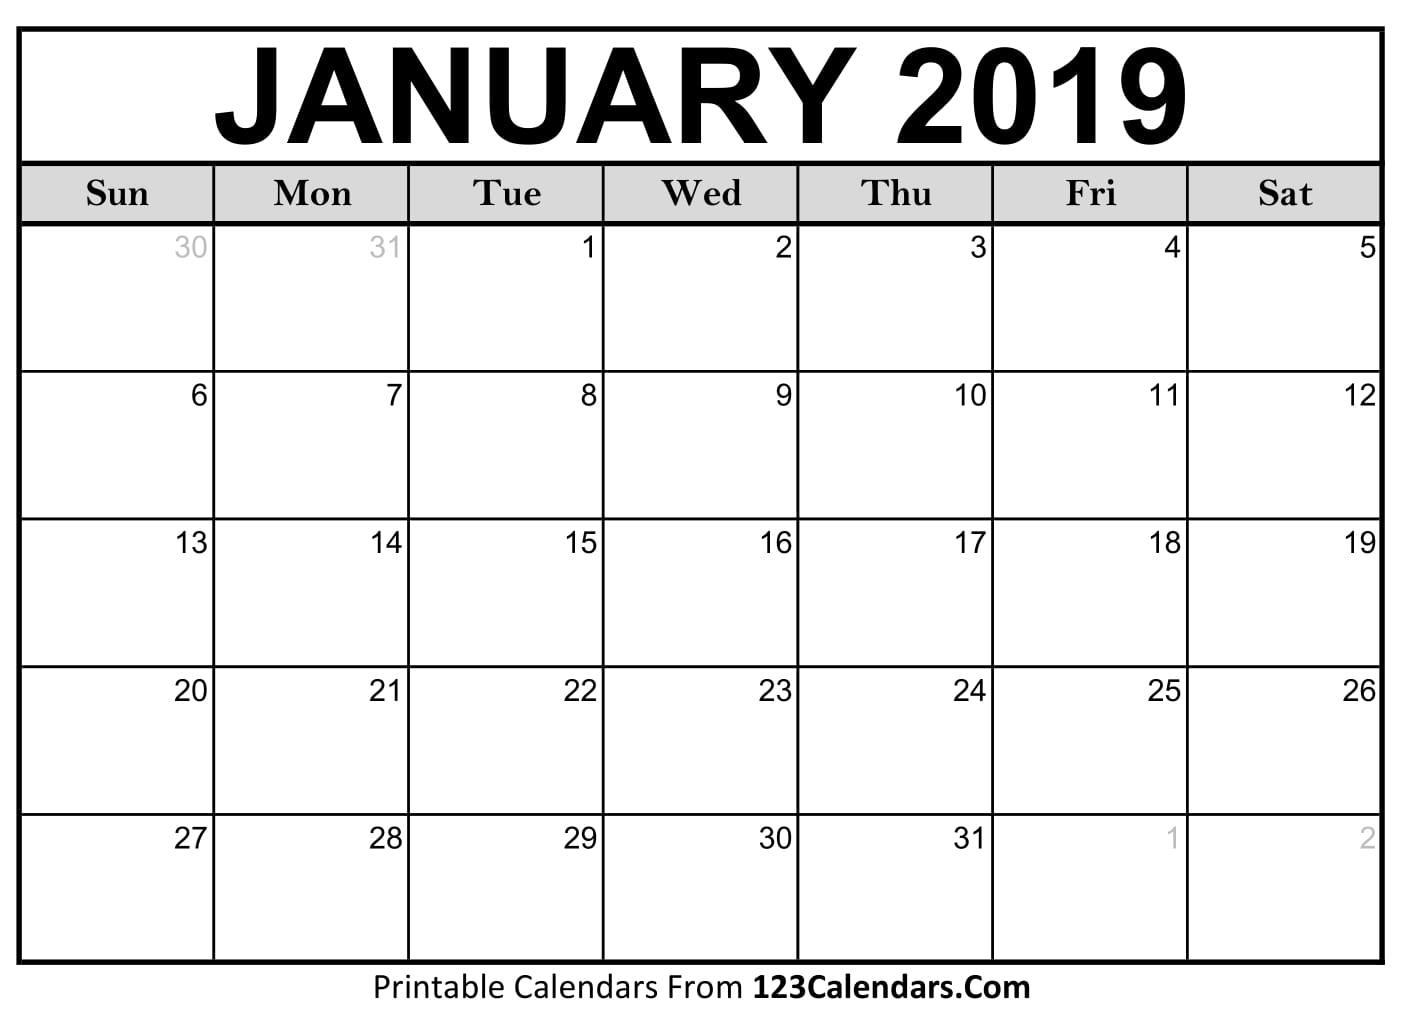 Free Printable Calendar | 123Calendars with regard to Calendar For 2019 And 2020 To Edit